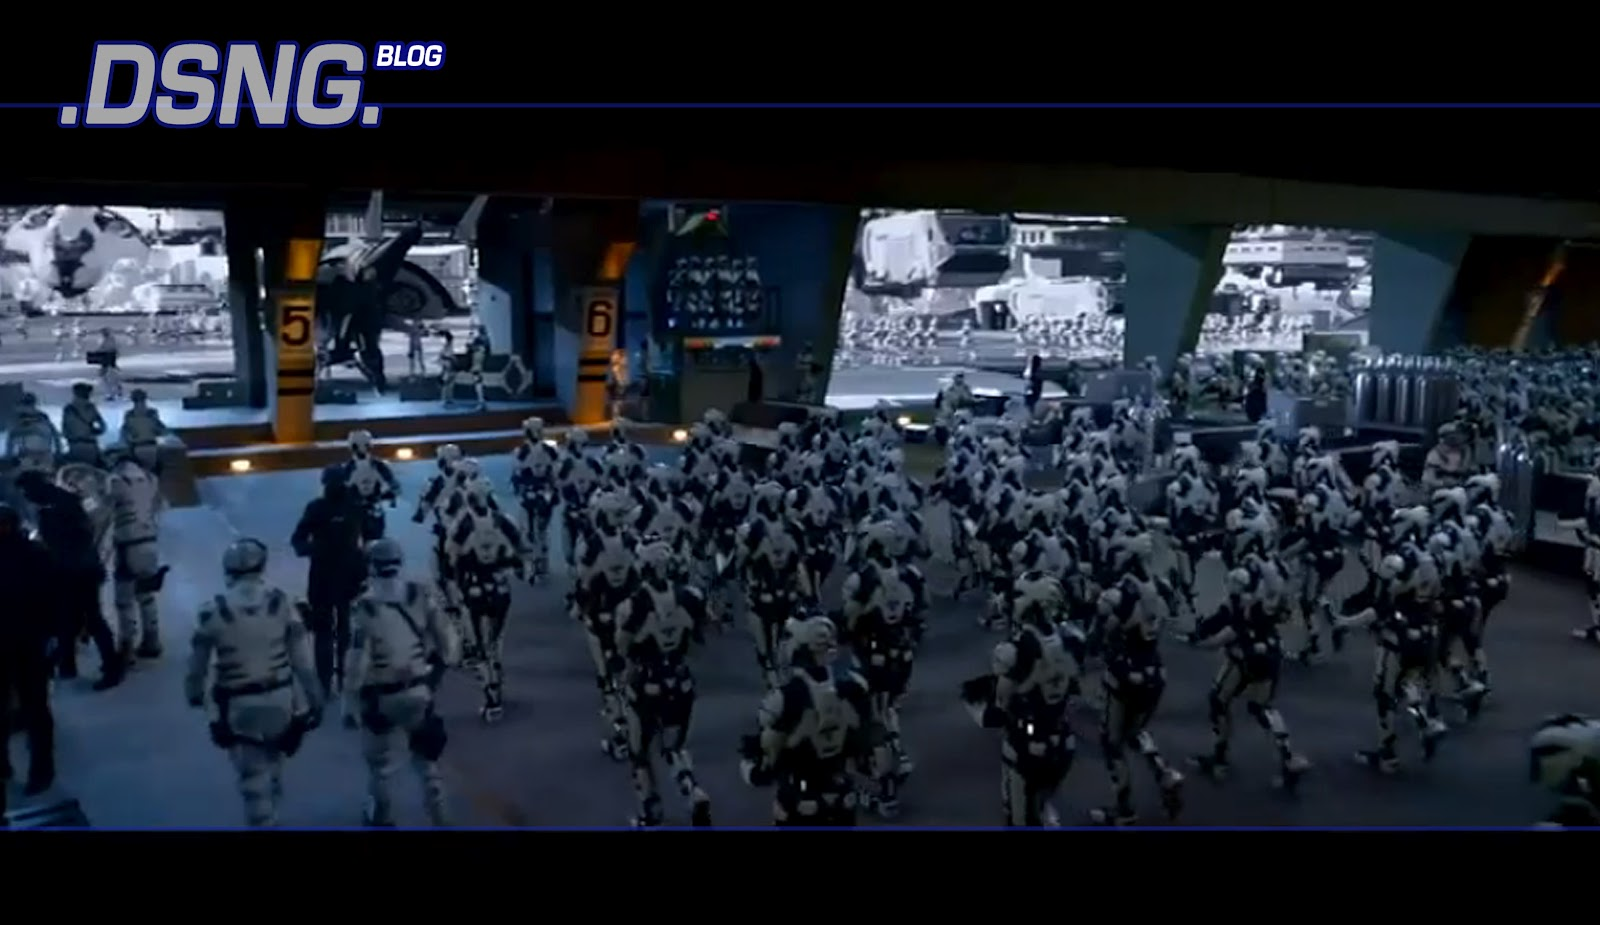 http://4.bp.blogspot.com/-5ovkpGWWvKw/T-4M9JVPJxI/AAAAAAAAGSk/Y6AHd_FtMRQ/s1600/colin+farrell+kate+beckinsale+total+recall+2012+movie+sci+fi+handgun+gun+weapon+concept+wallpaper++futuristic+hovercar+police+robot+droids+cyborgs+star+wars+clone+army.jpg